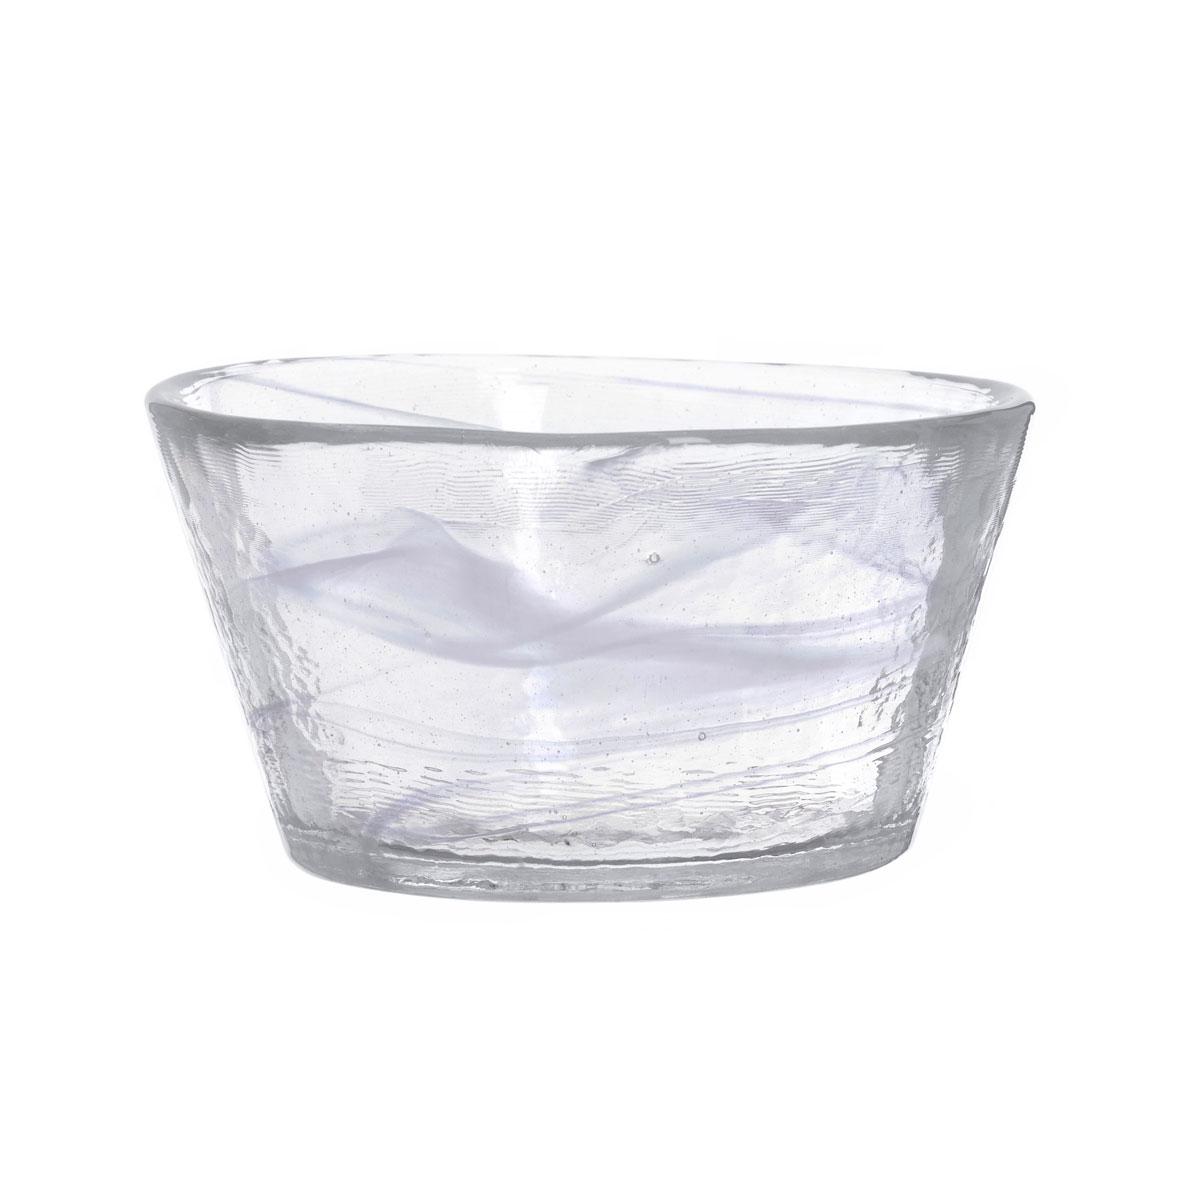 "Kosta Boda Crystal Mine White 5.25"" Bowl"